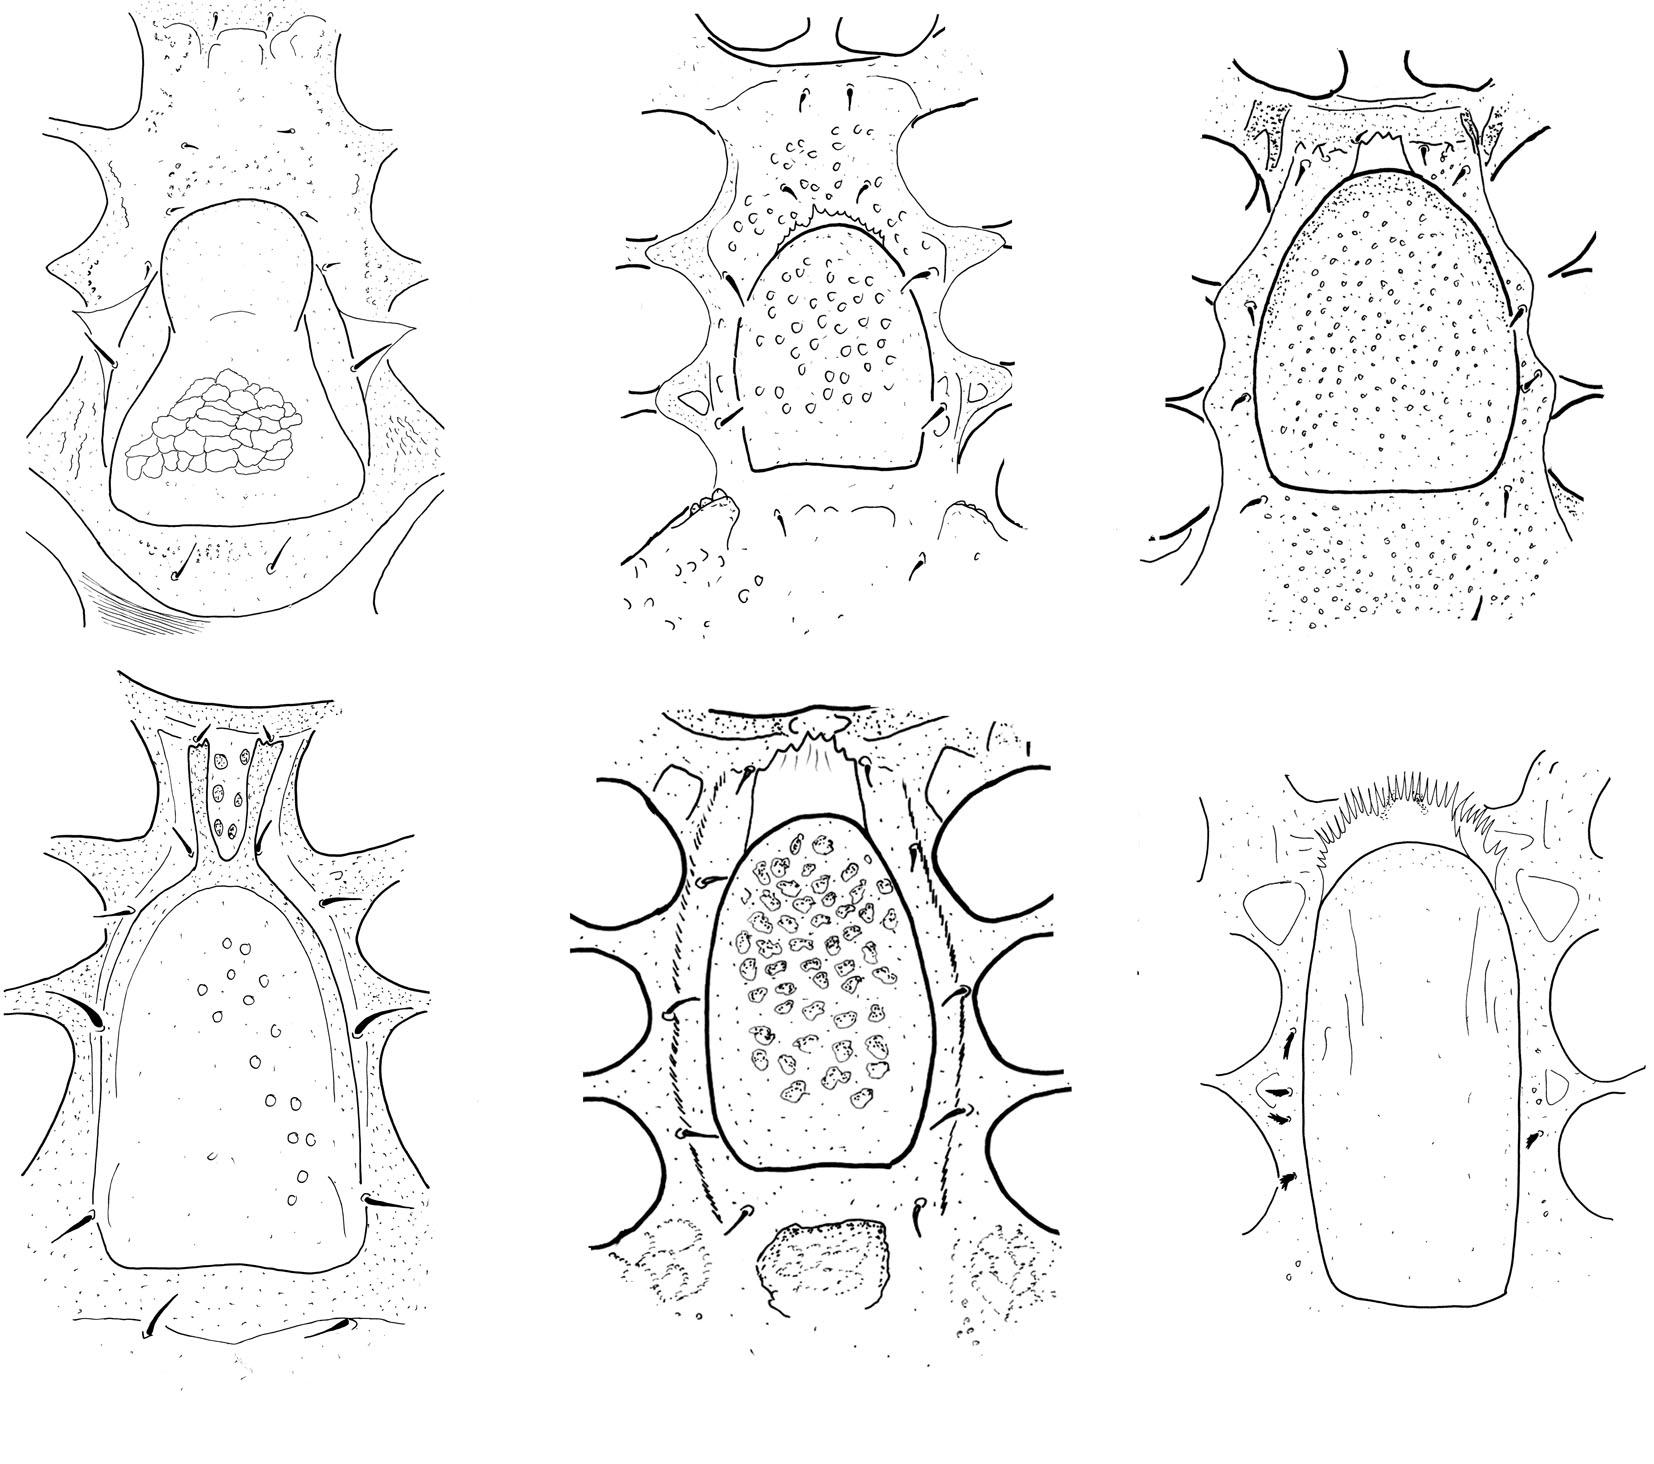 genital shields.jpg